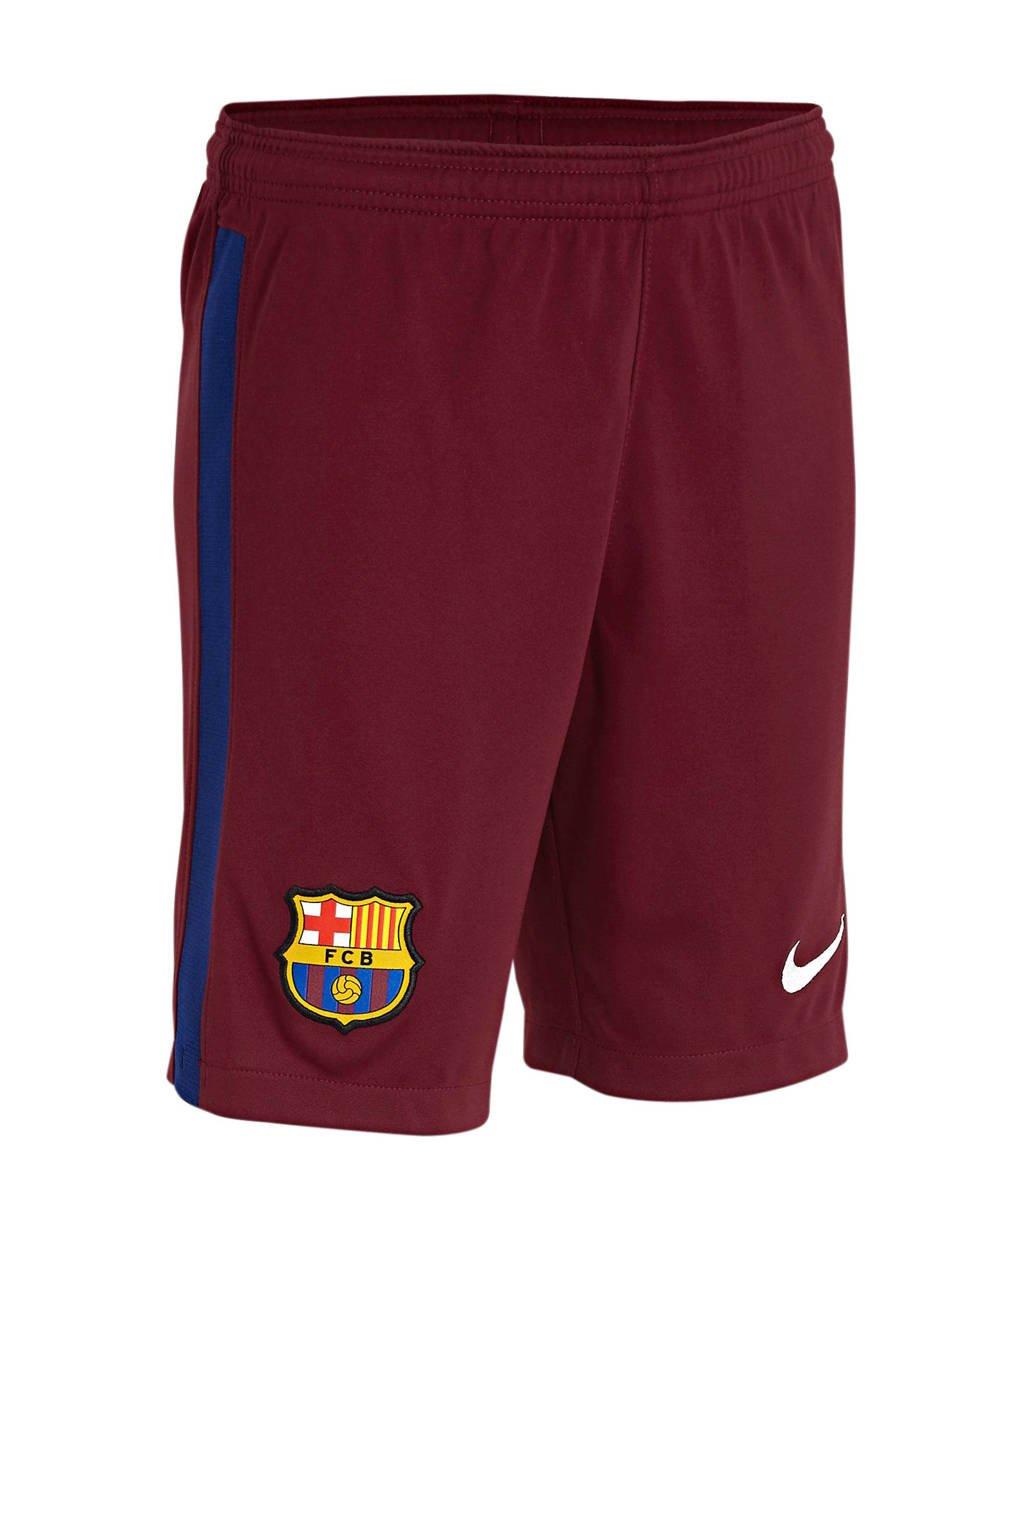 Nike Junior FC Barcelona keepers short donkerrood, Donkerrood